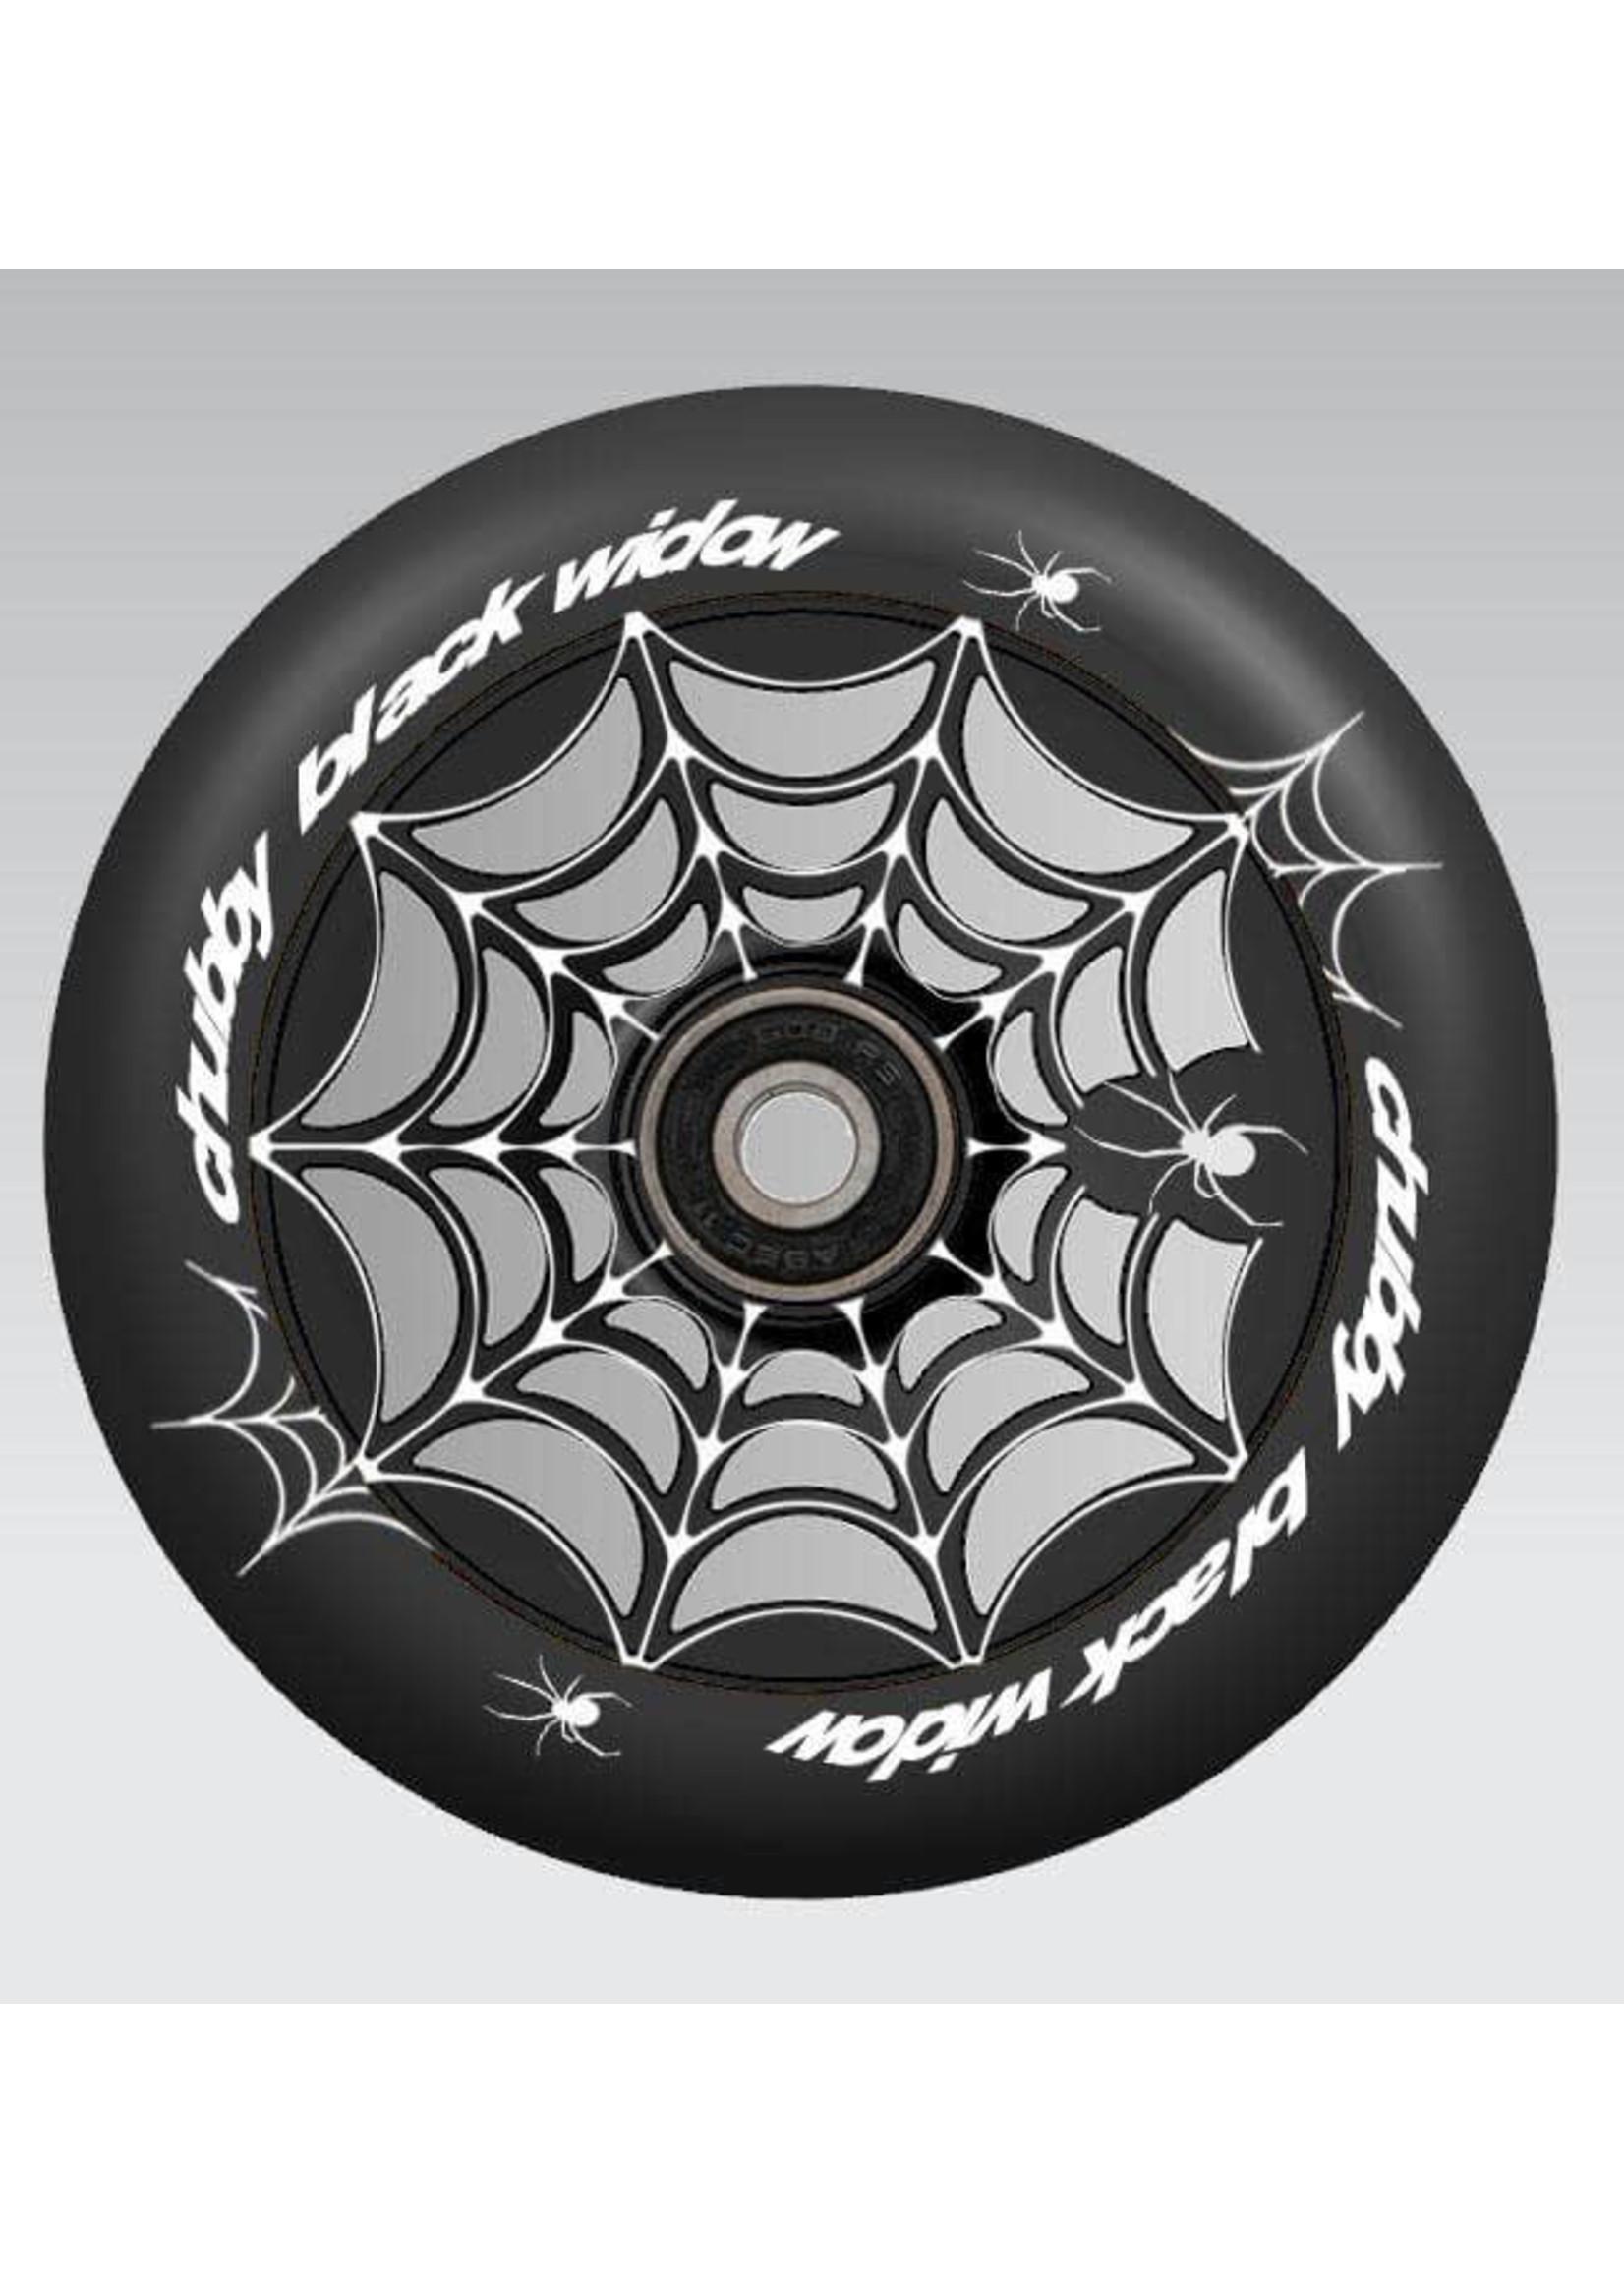 Chubby Chubby - Black Widow V2 Wheels - 110mm